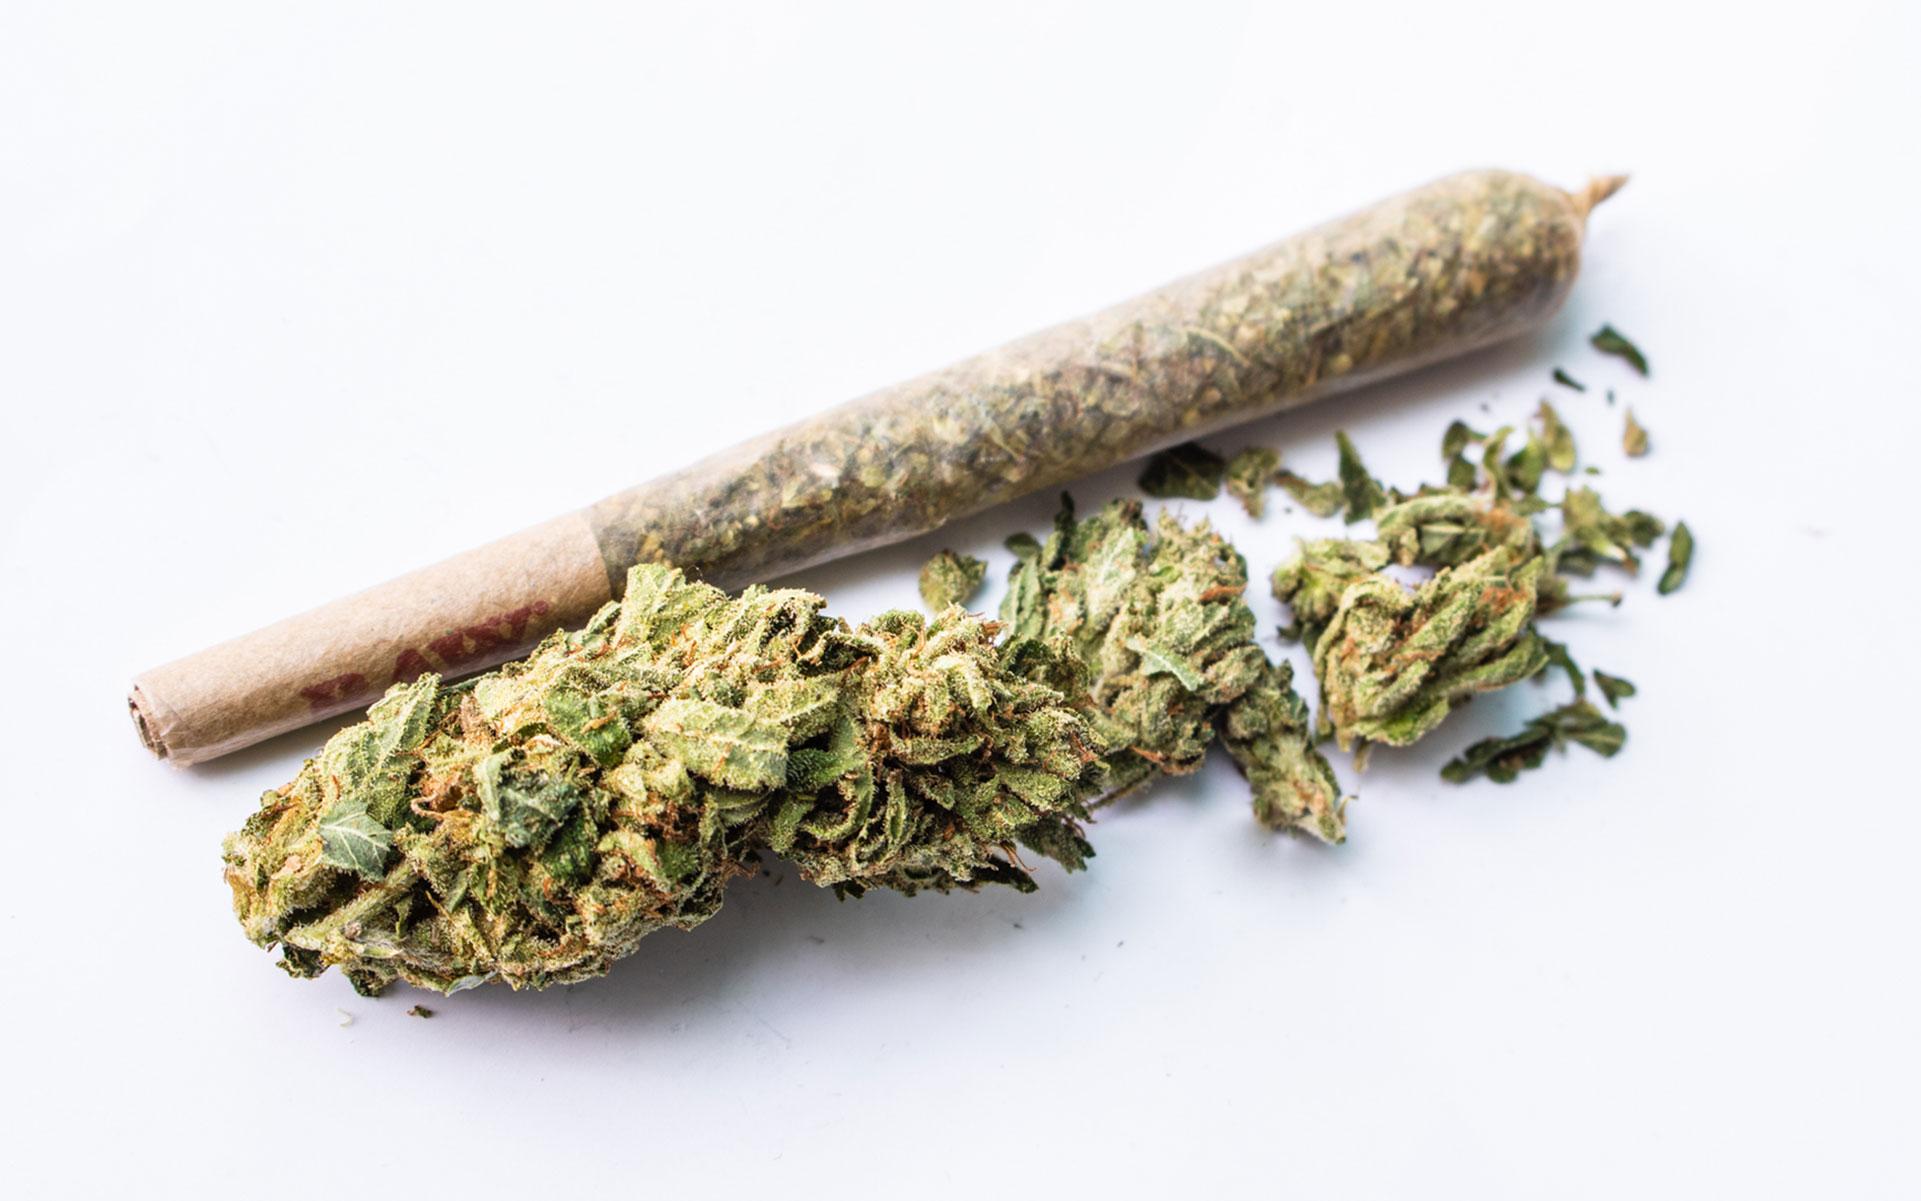 cbd, thc, cbd vs thc, cannabis, marijuana